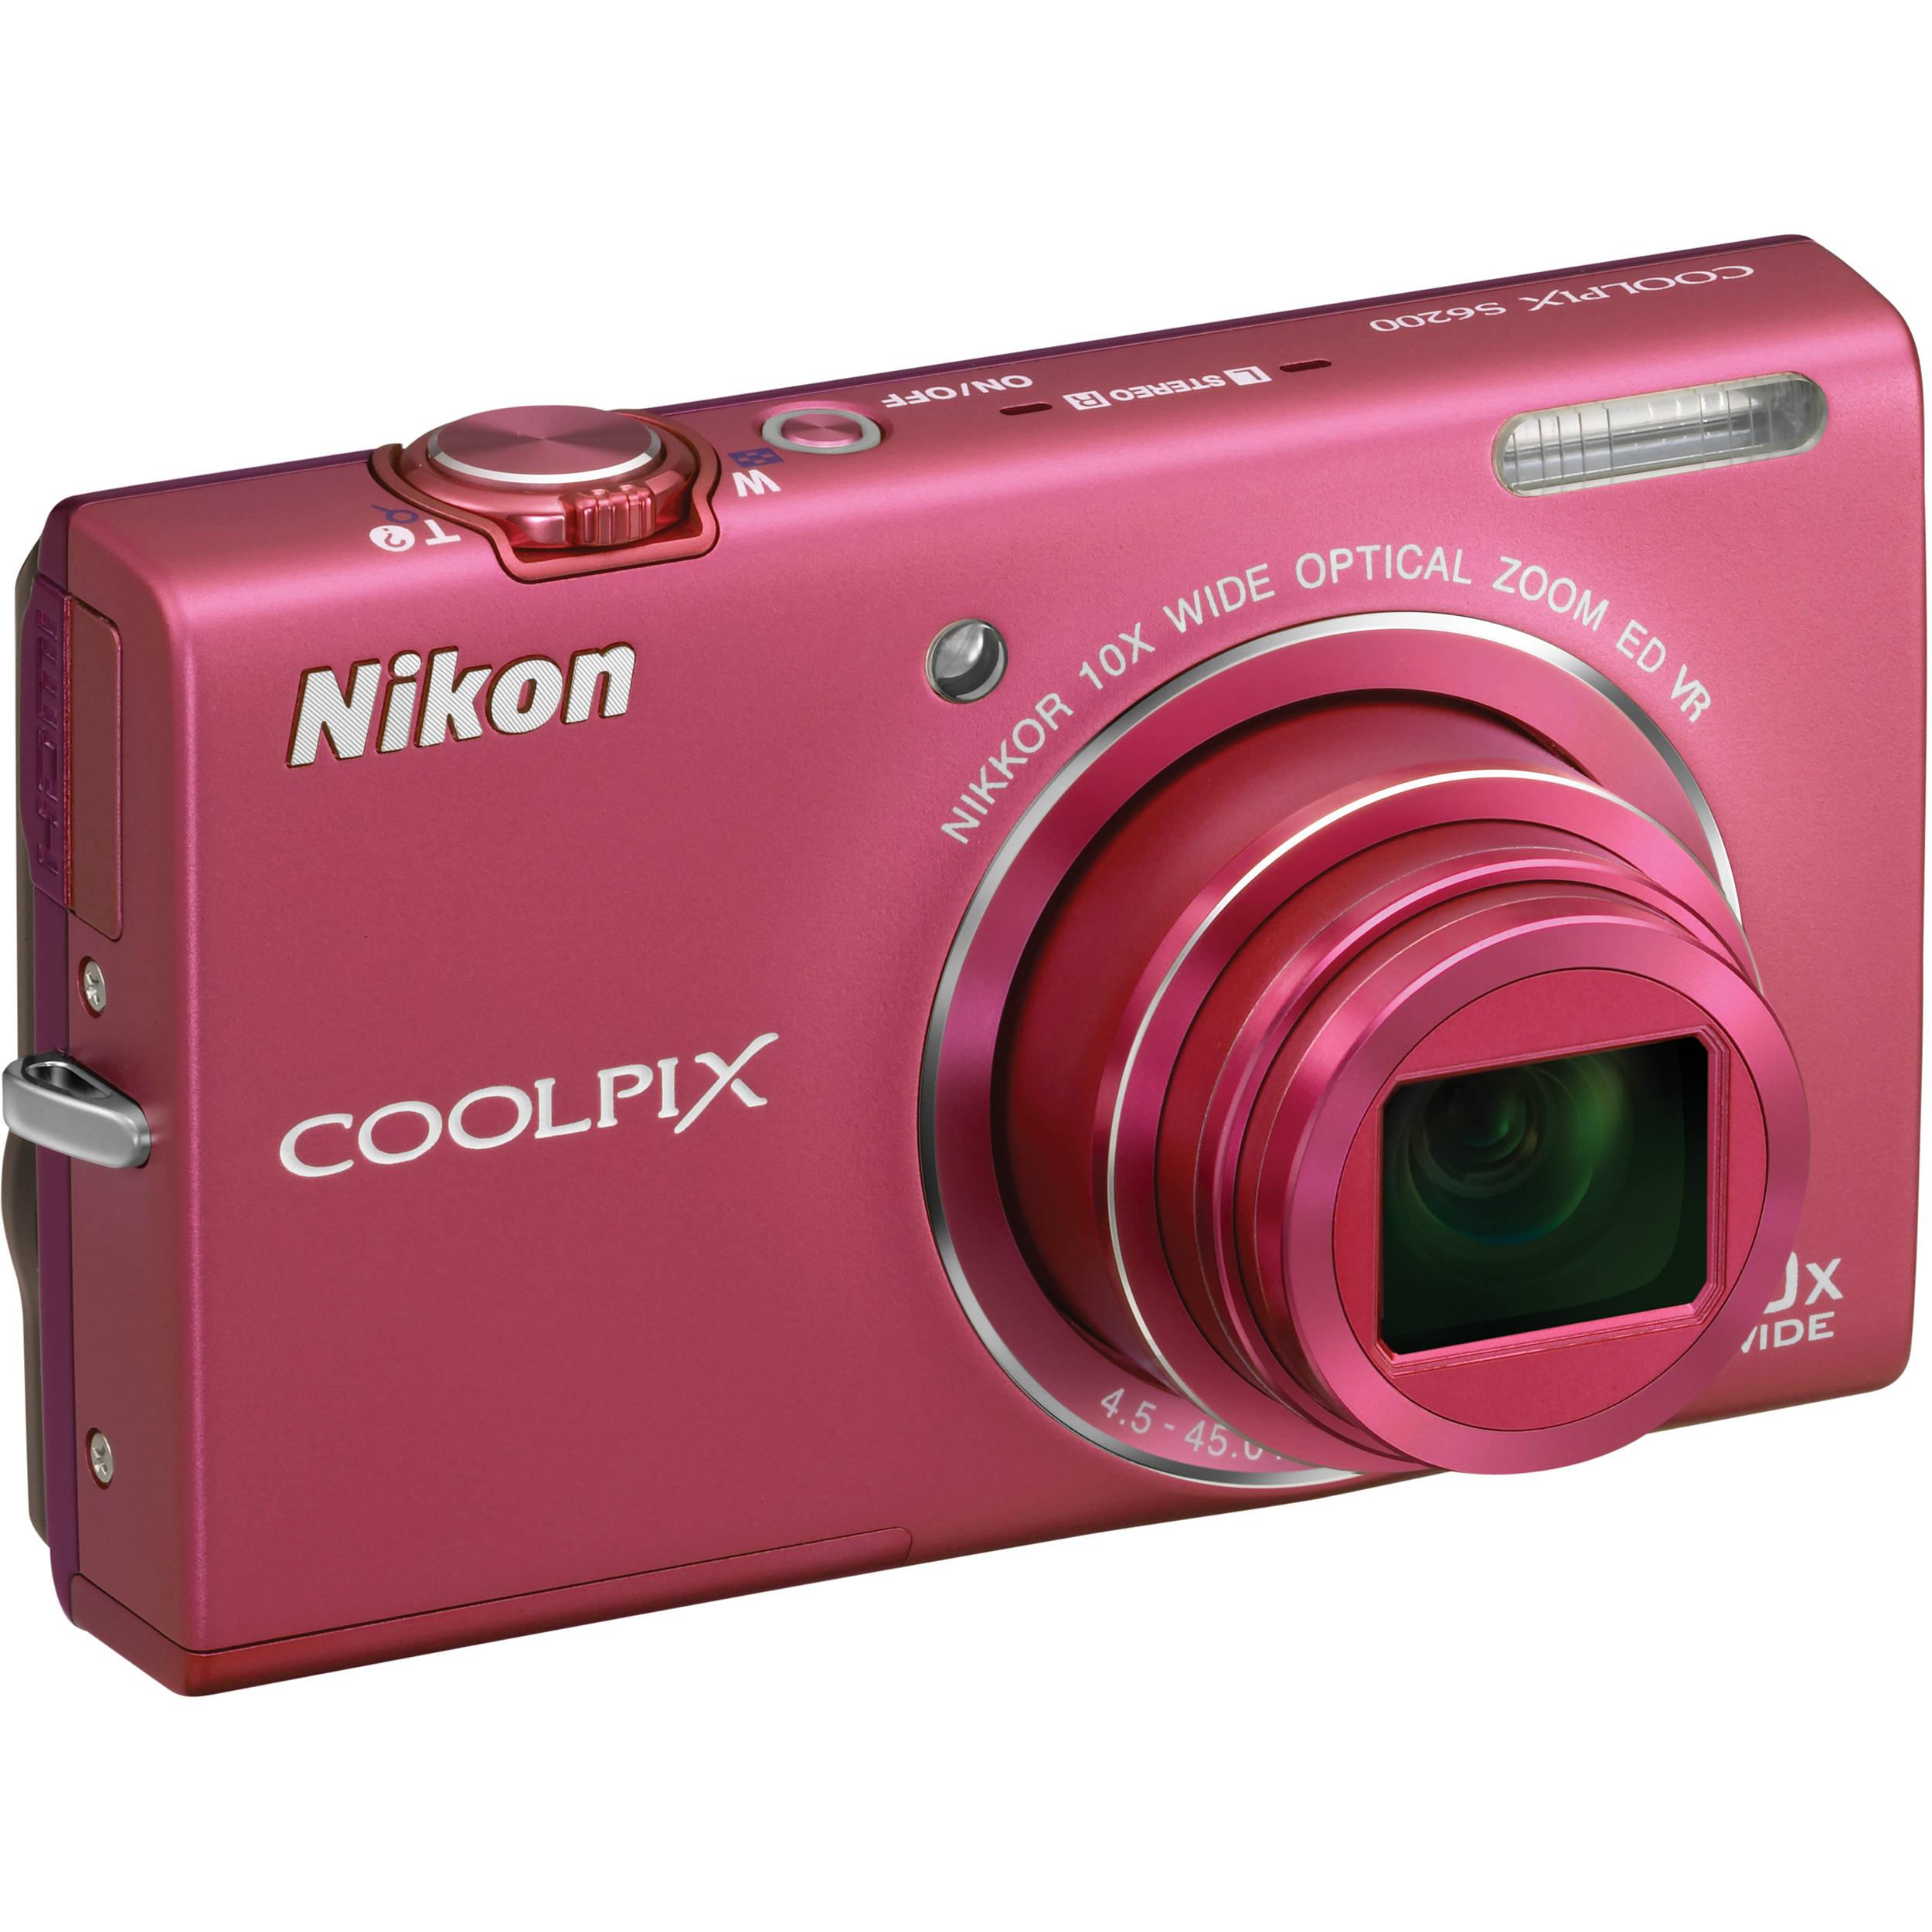 Nikon Coolpix S6200 Digital Camera (Pink) 26277 B&H Photo